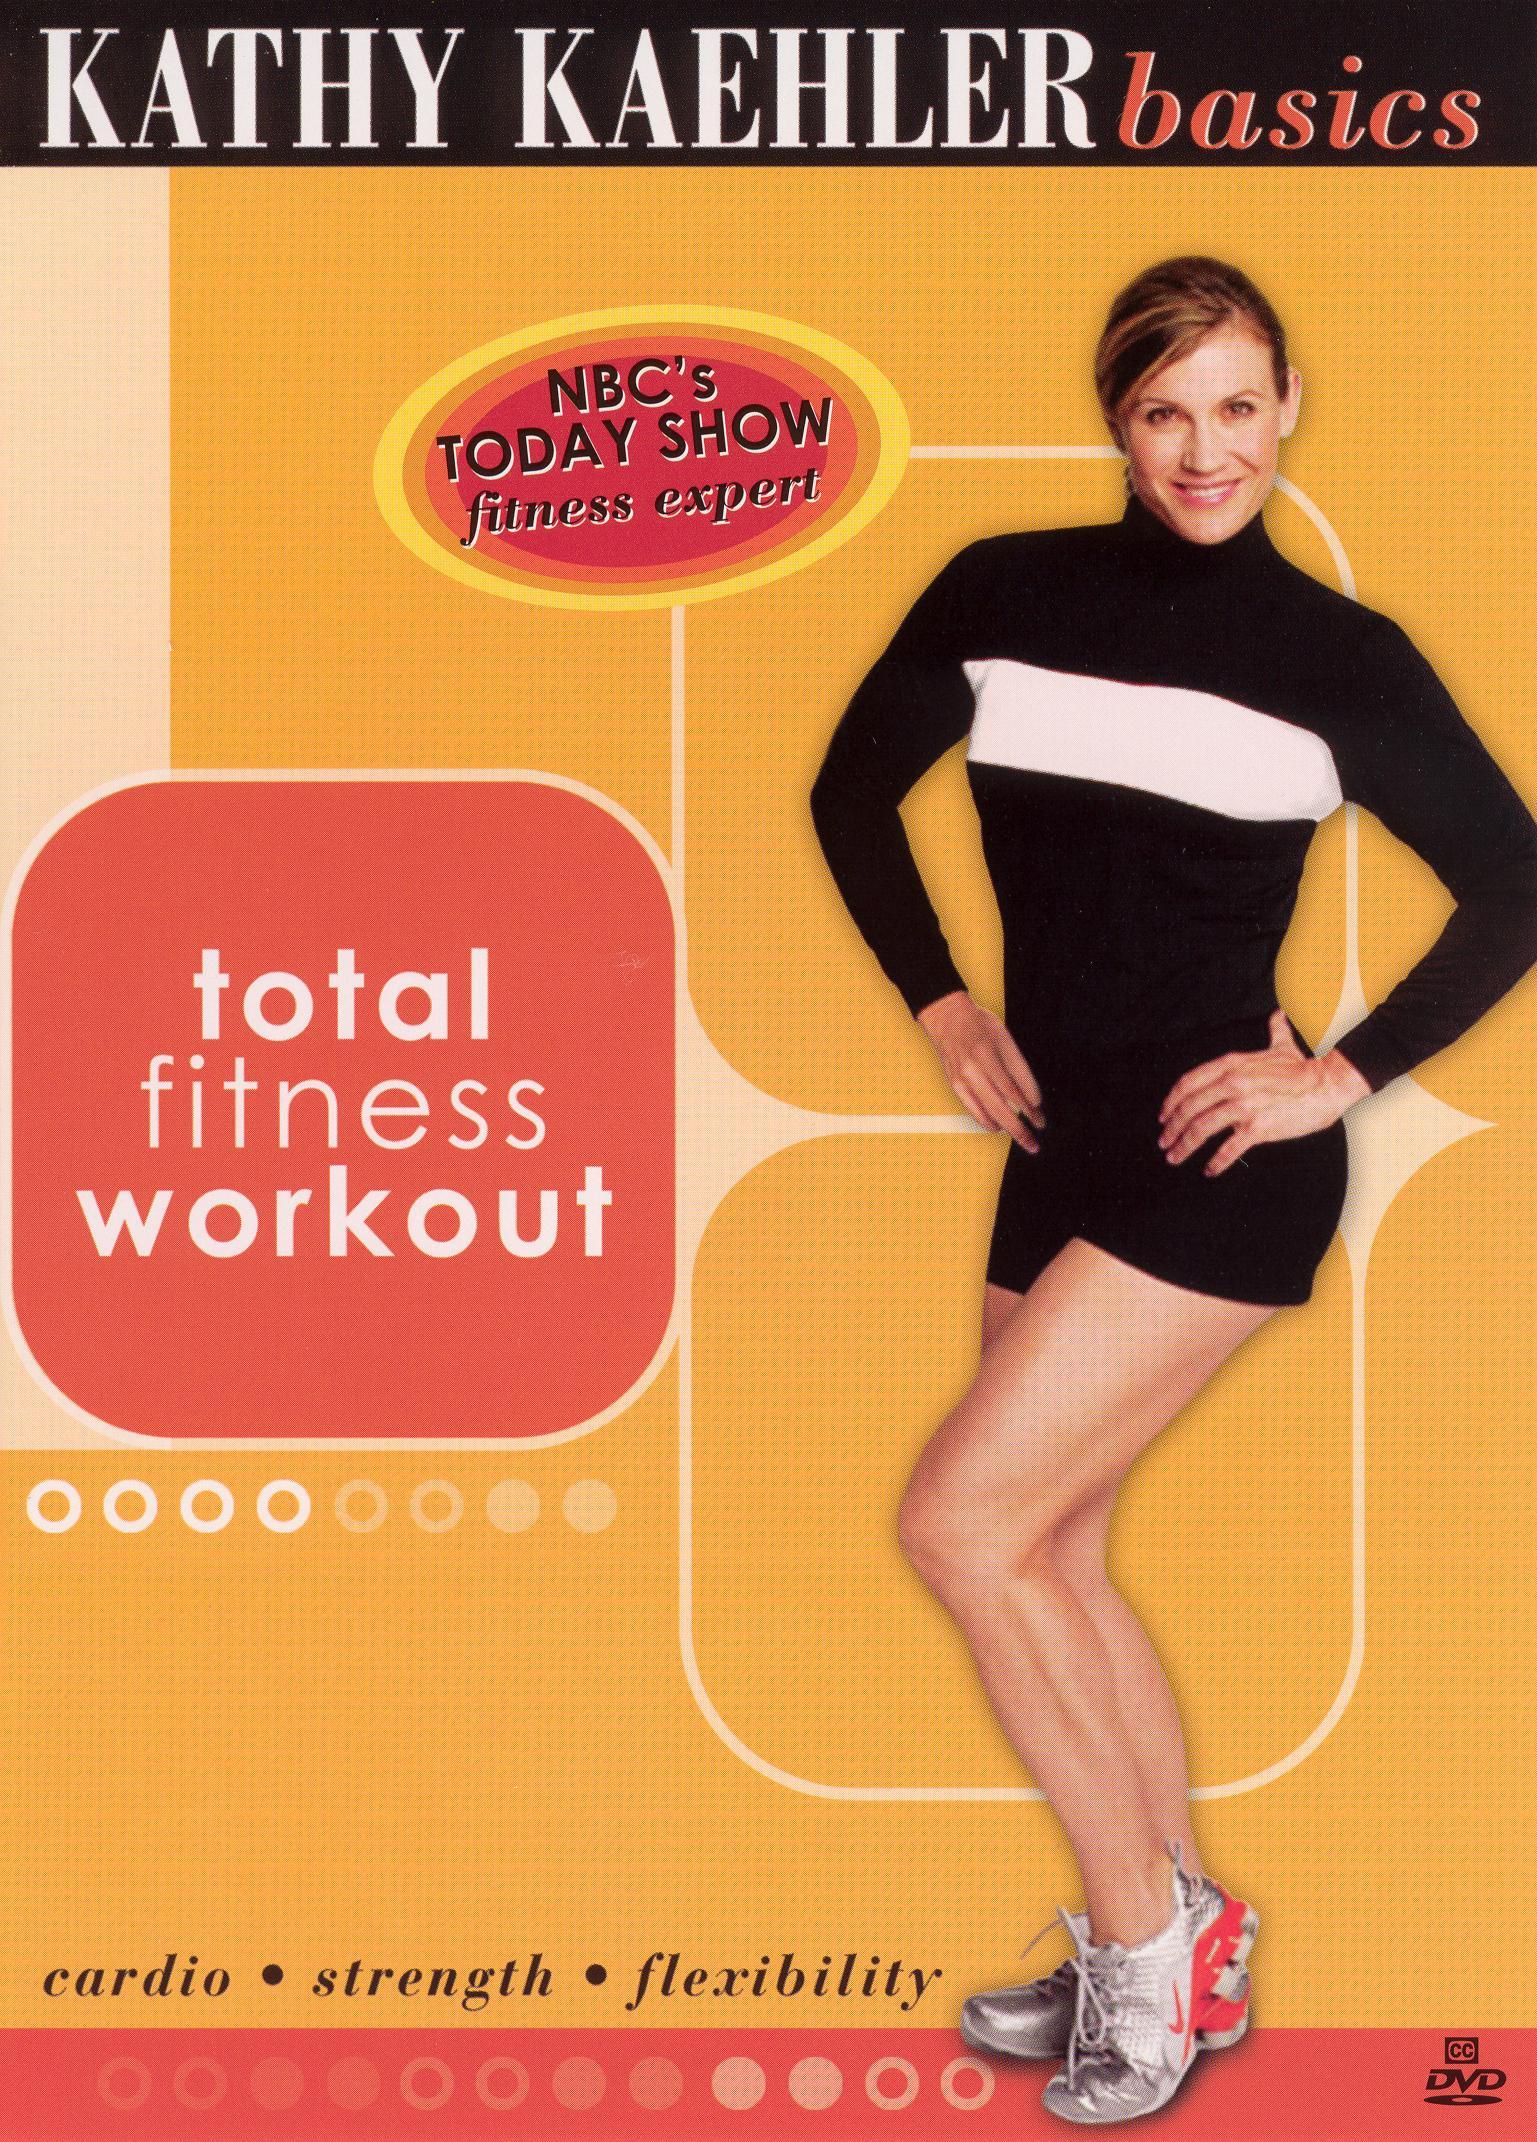 Kathy Kaehler Basics: Total Fitness Workout